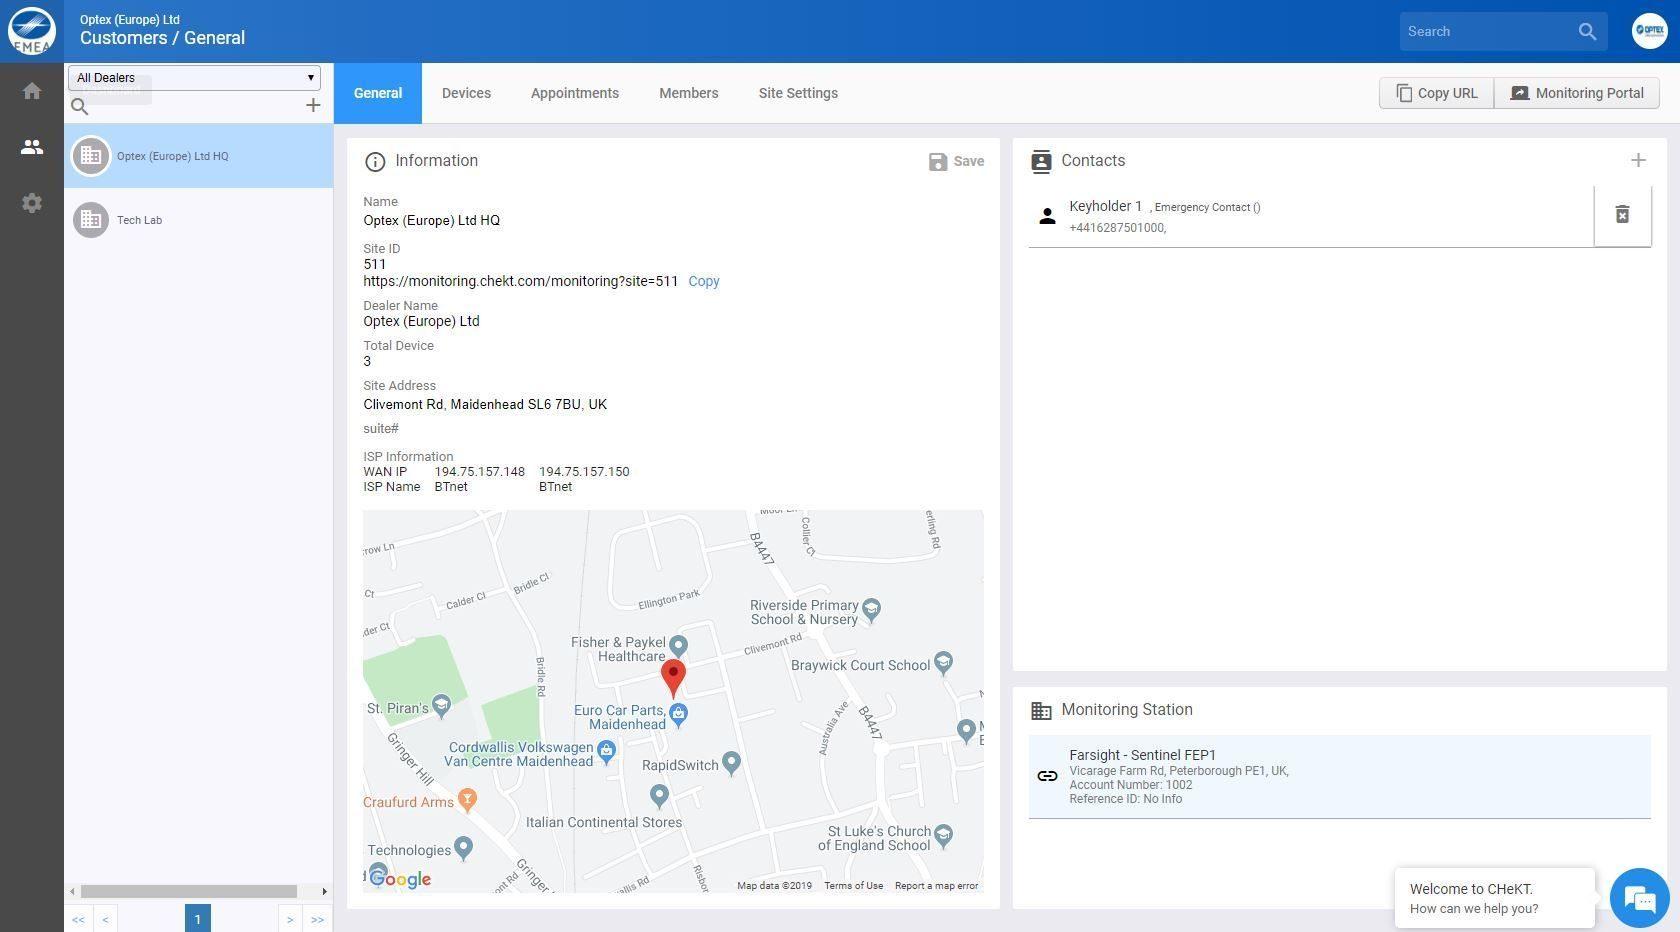 Intelligent Visual Monitoring Portal